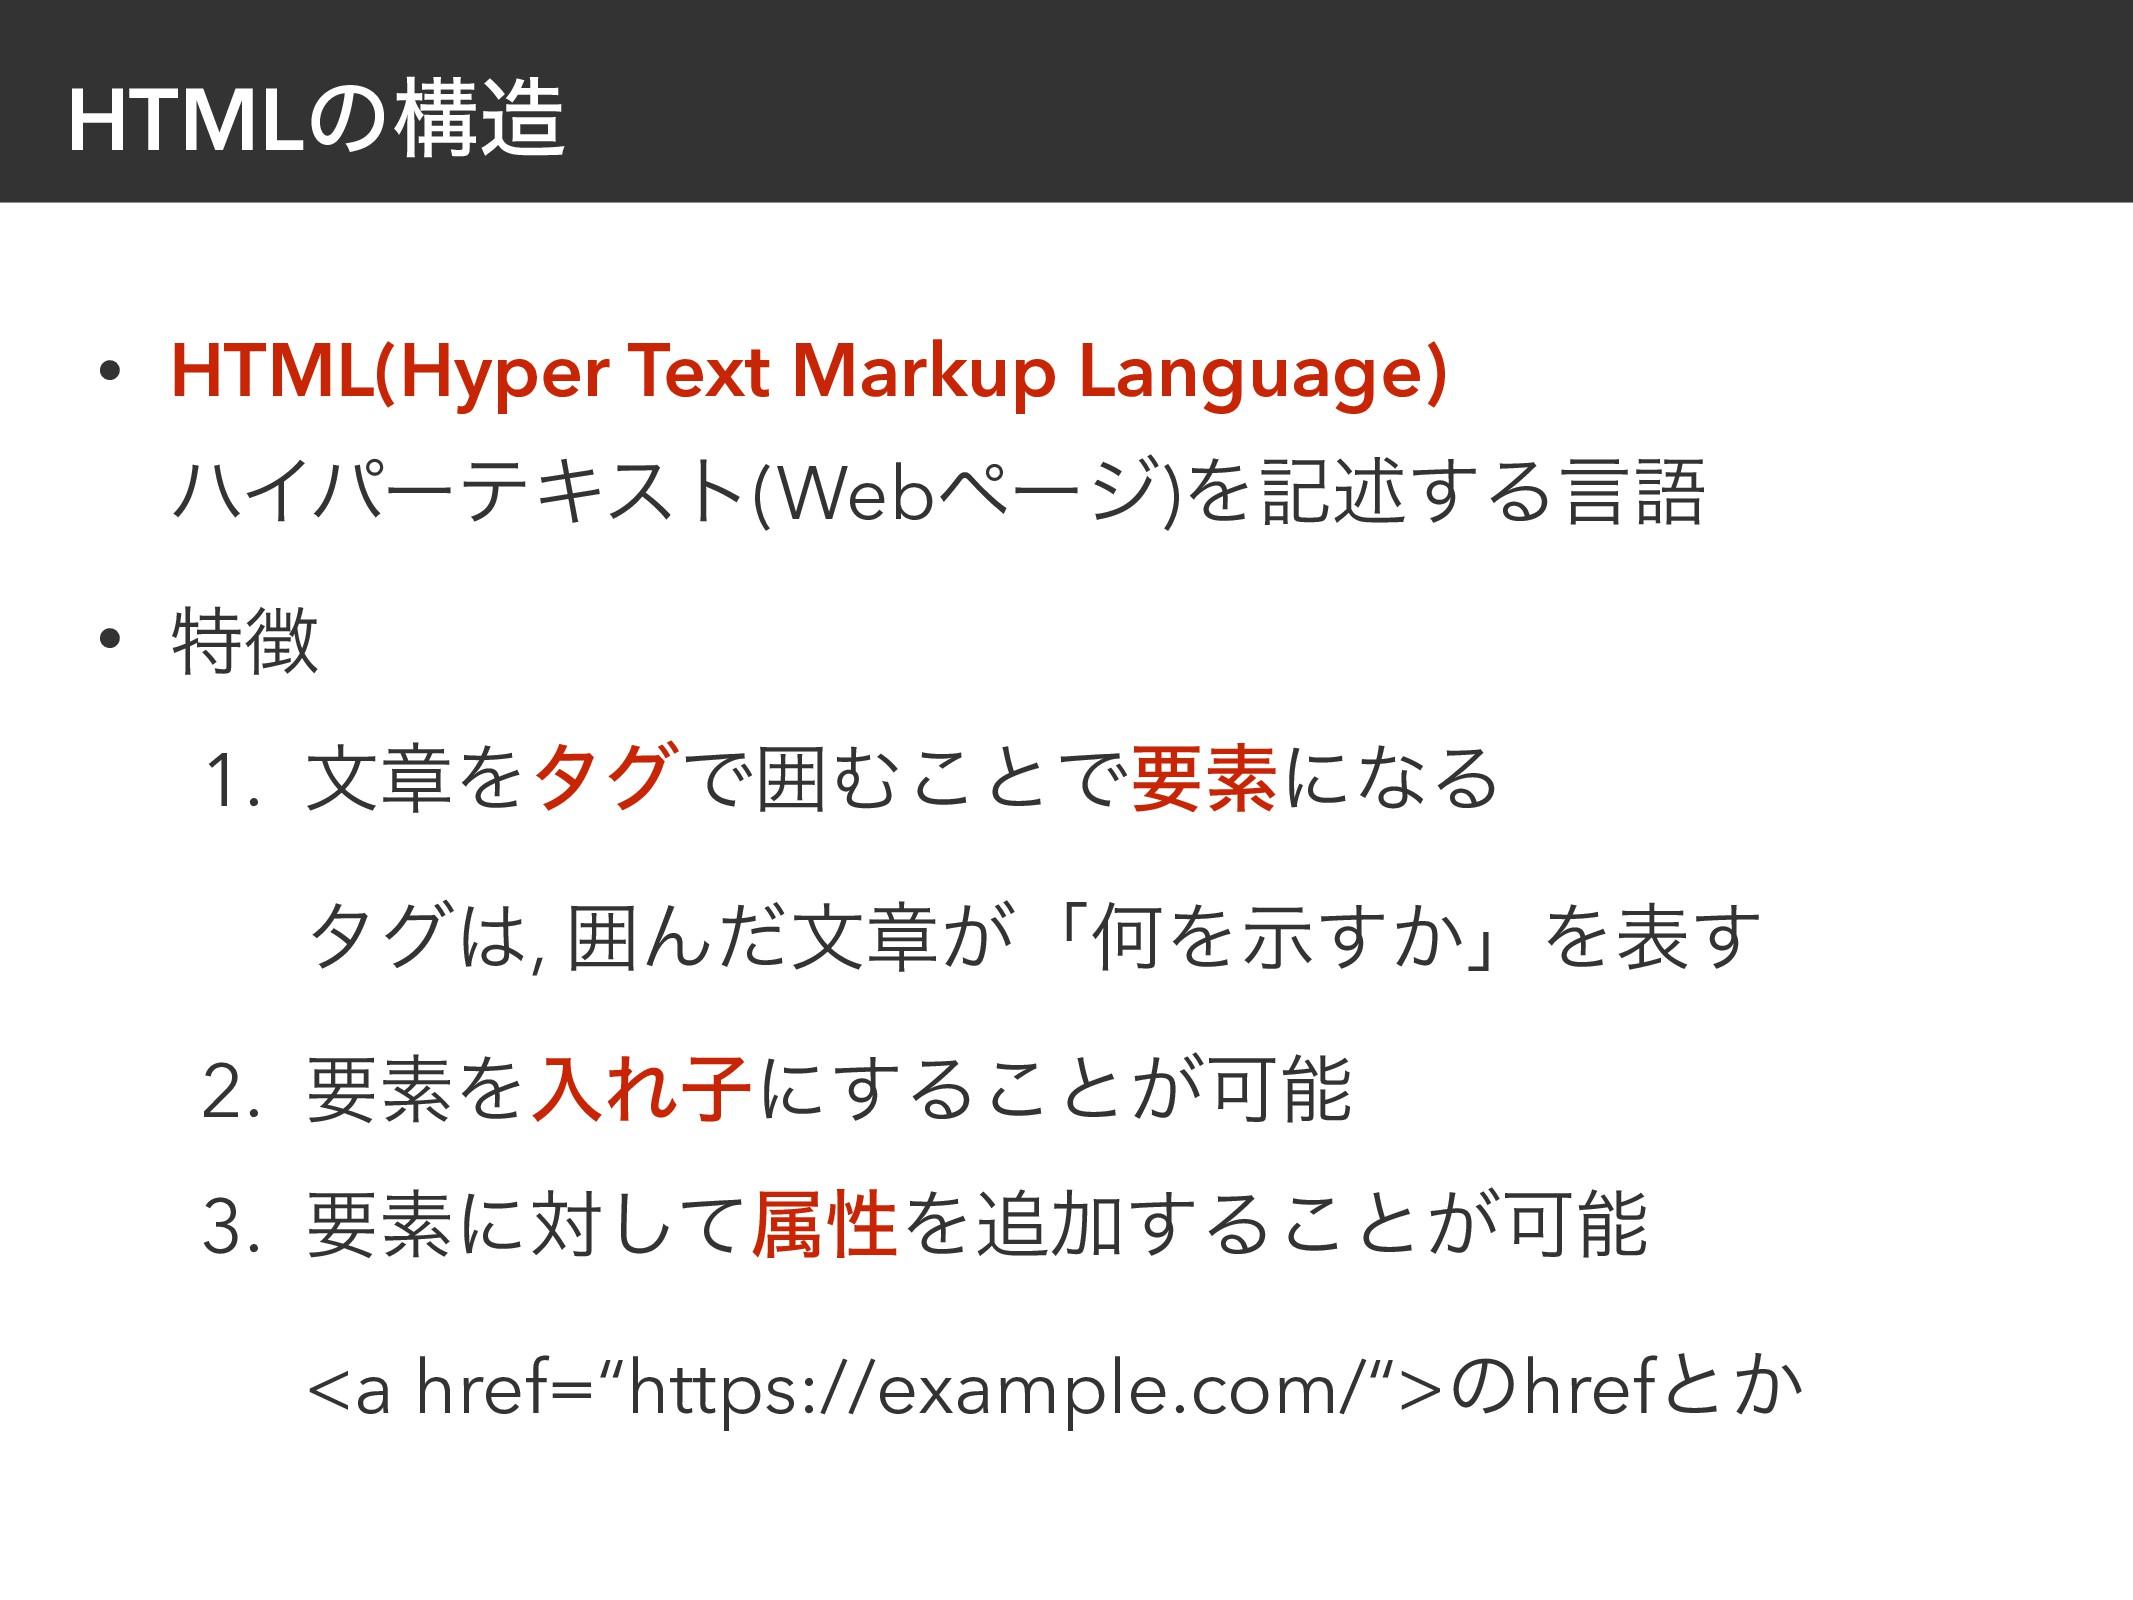 HTMLͷߏ • HTML(Hyper Text Markup Language) ϋΠύ...